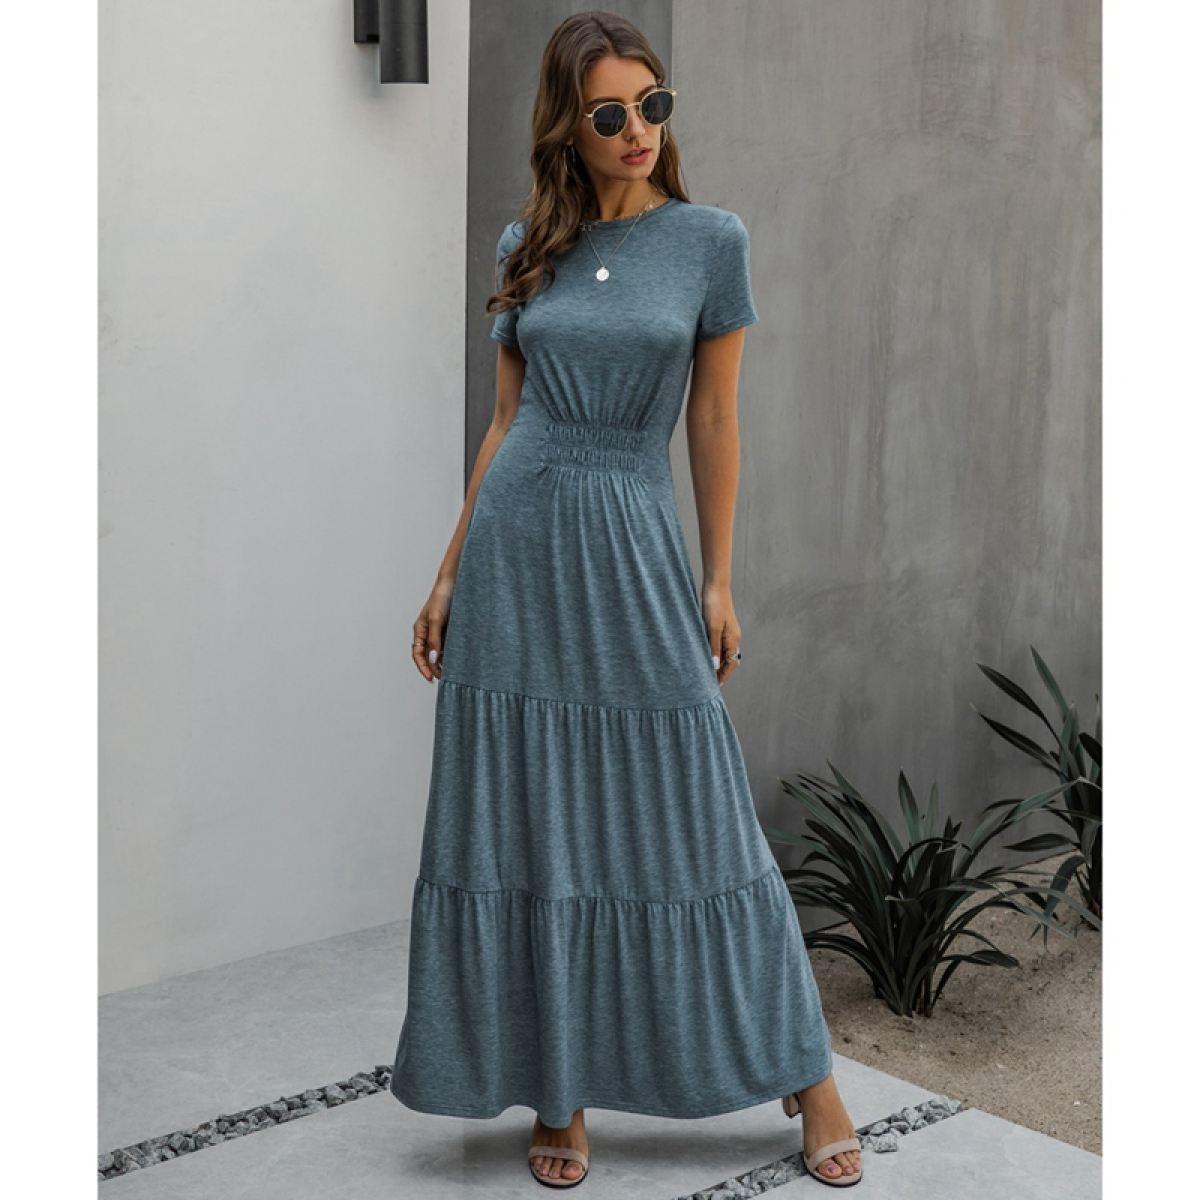 Long Robes T Shirt Dress Women Elegant Ruched A Line Dresses Casual Ladies Summer Maxi Dresses Lazada